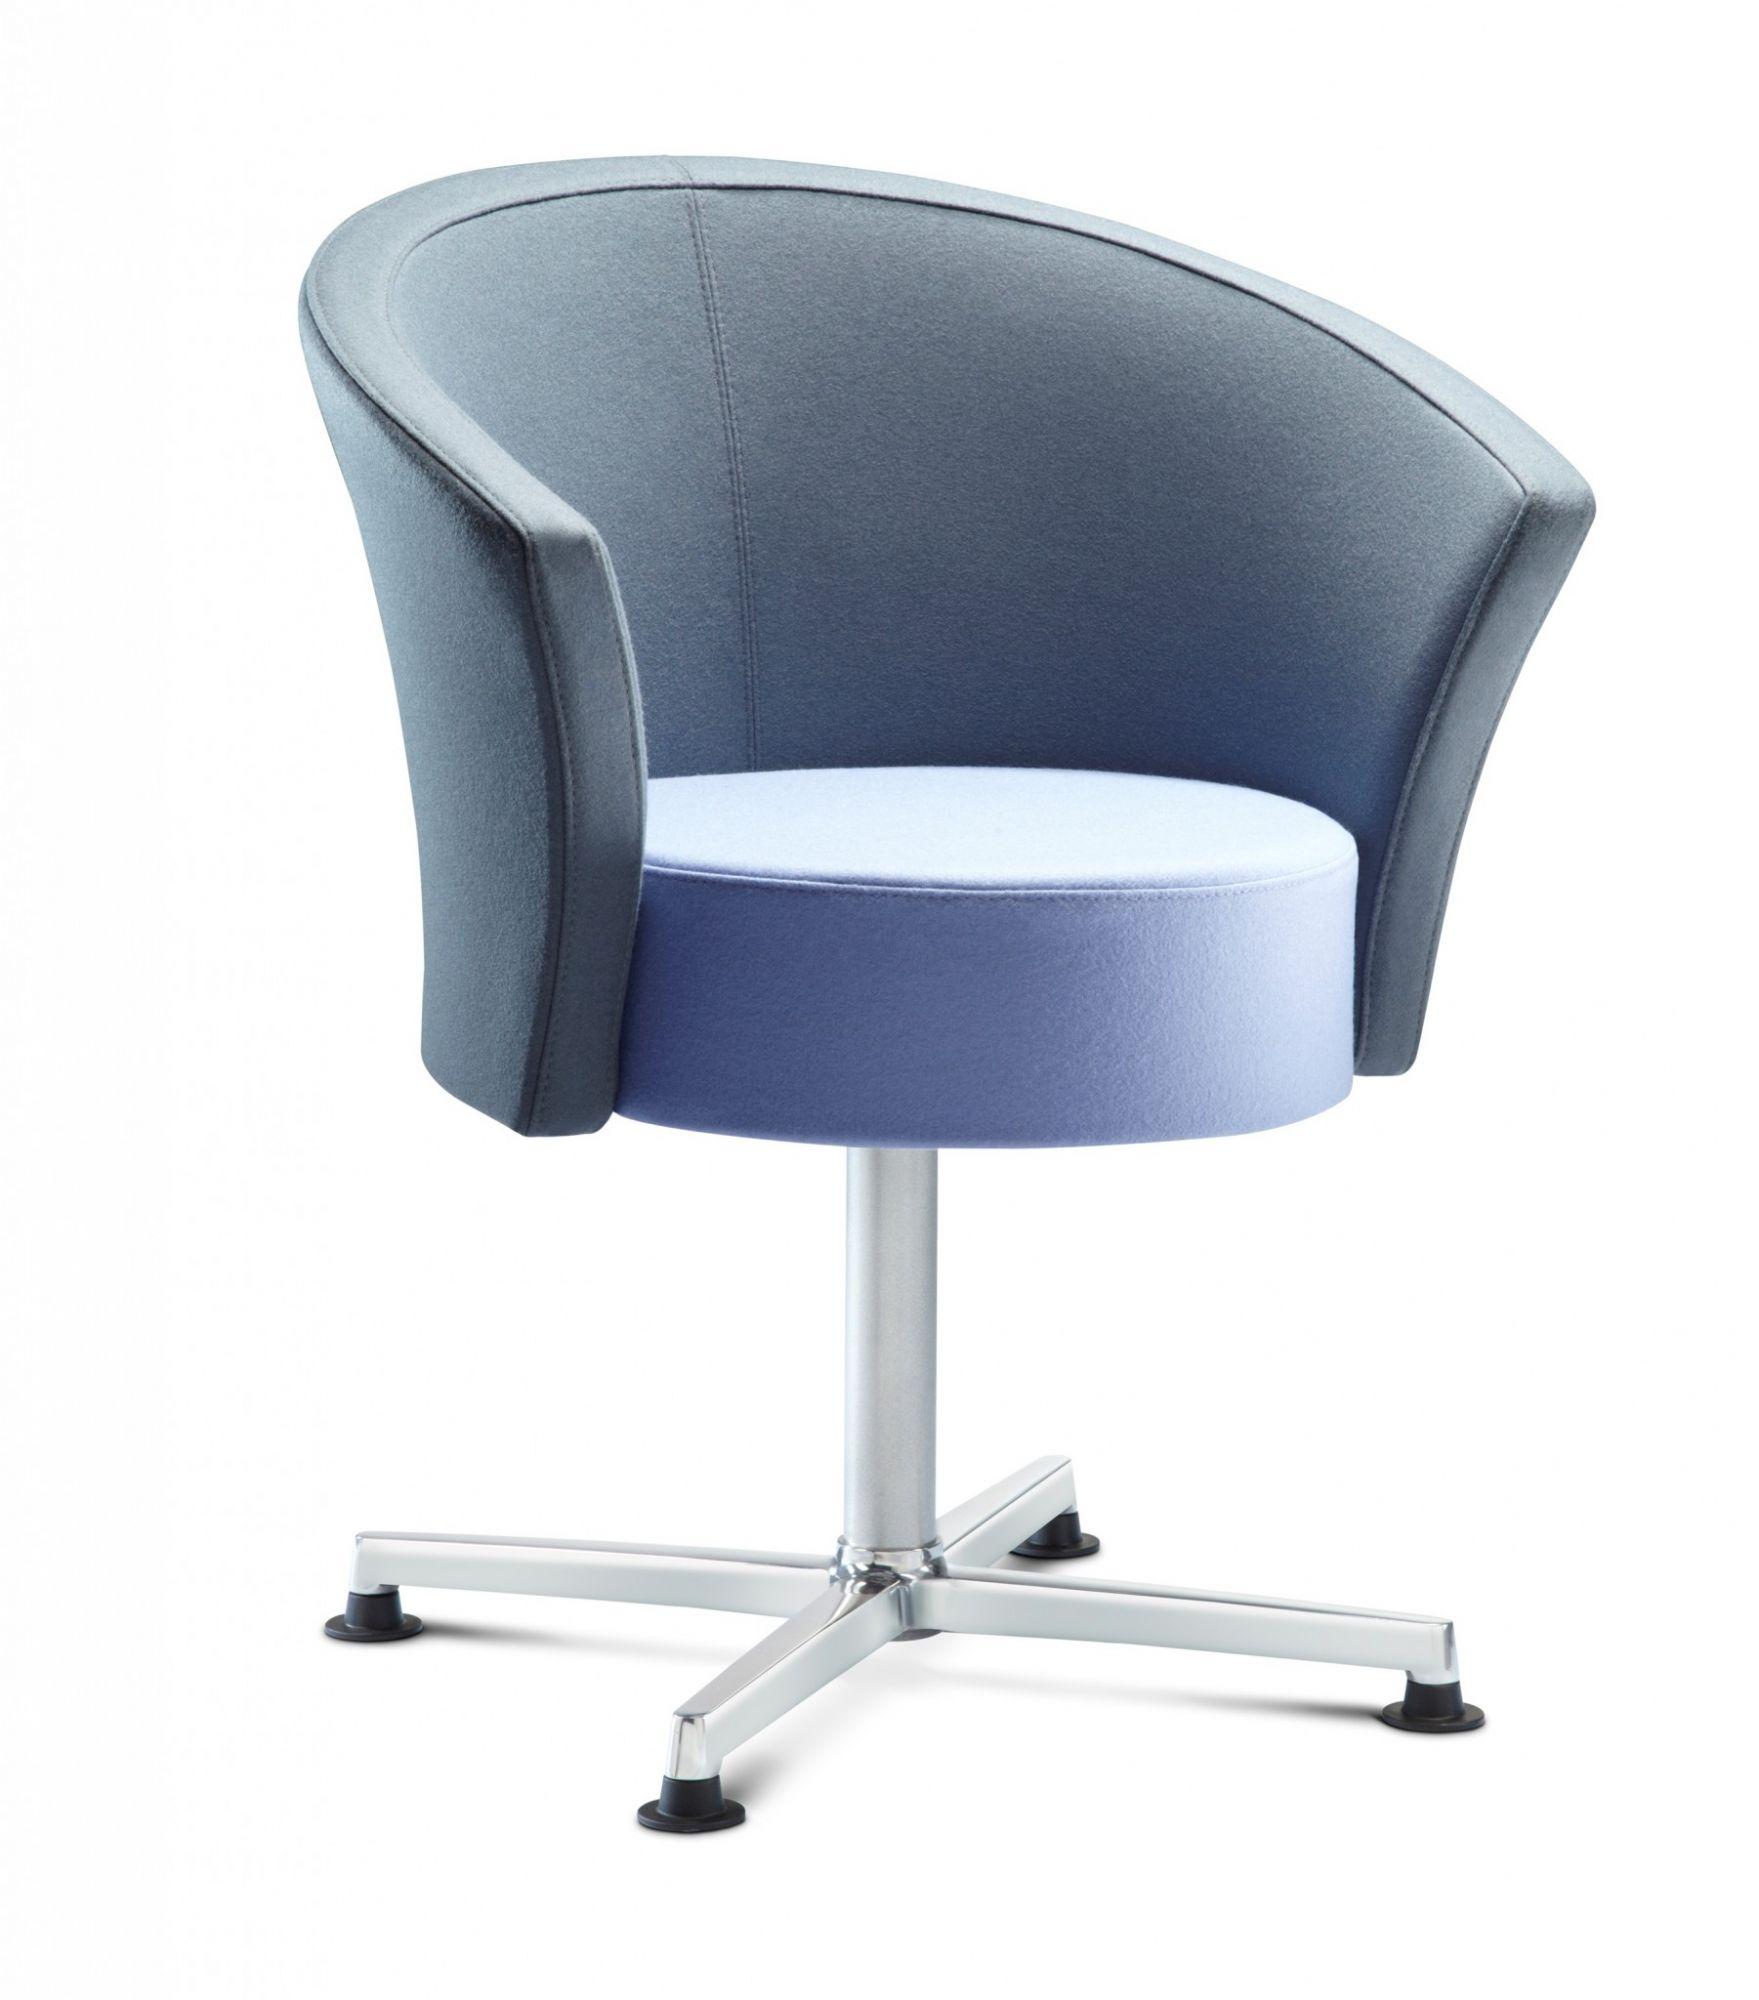 bobbin designer chair 4 star base